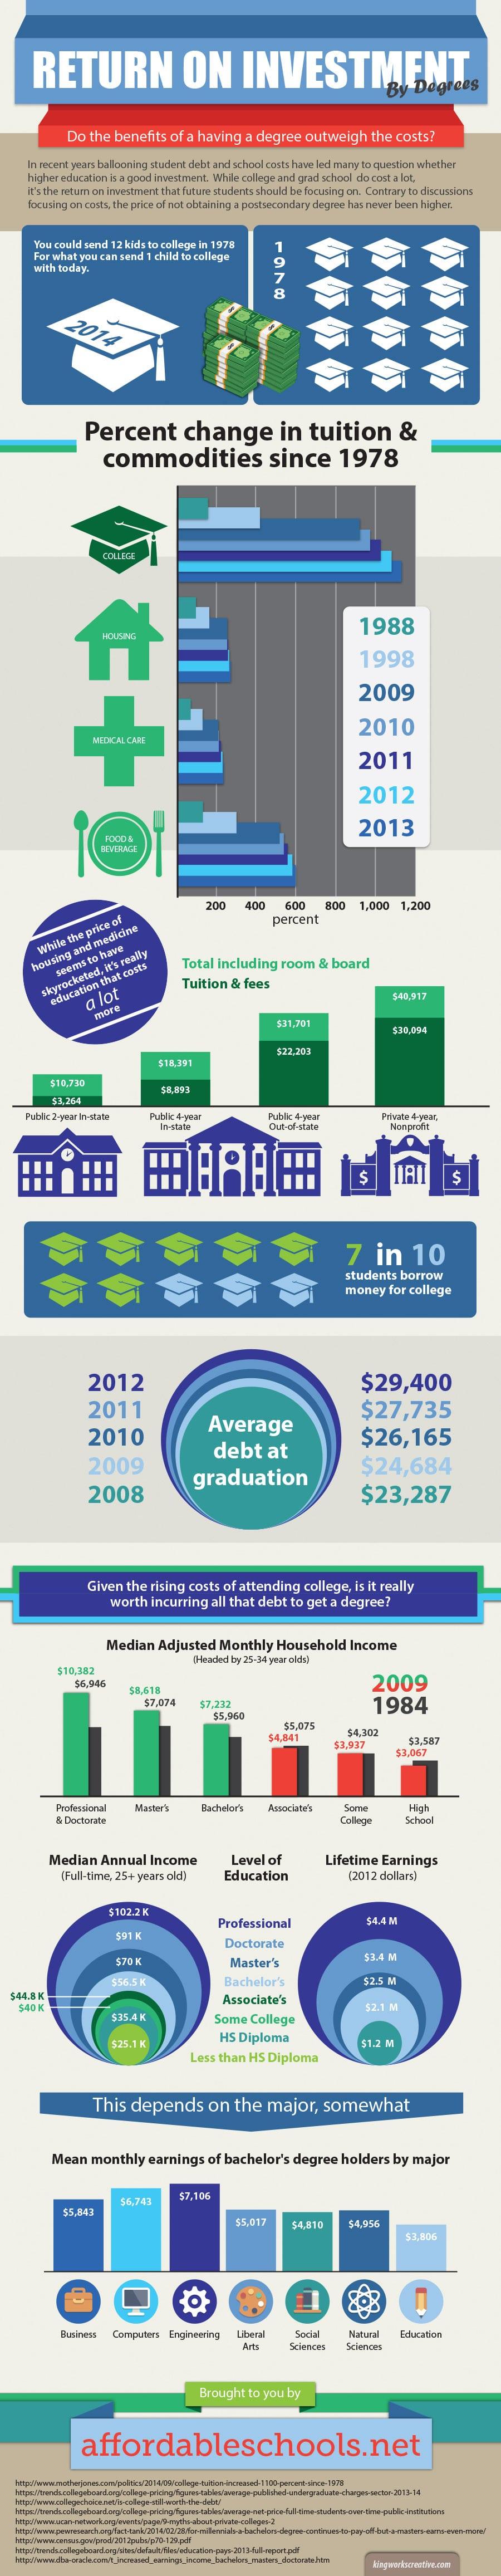 Higher Education ROI